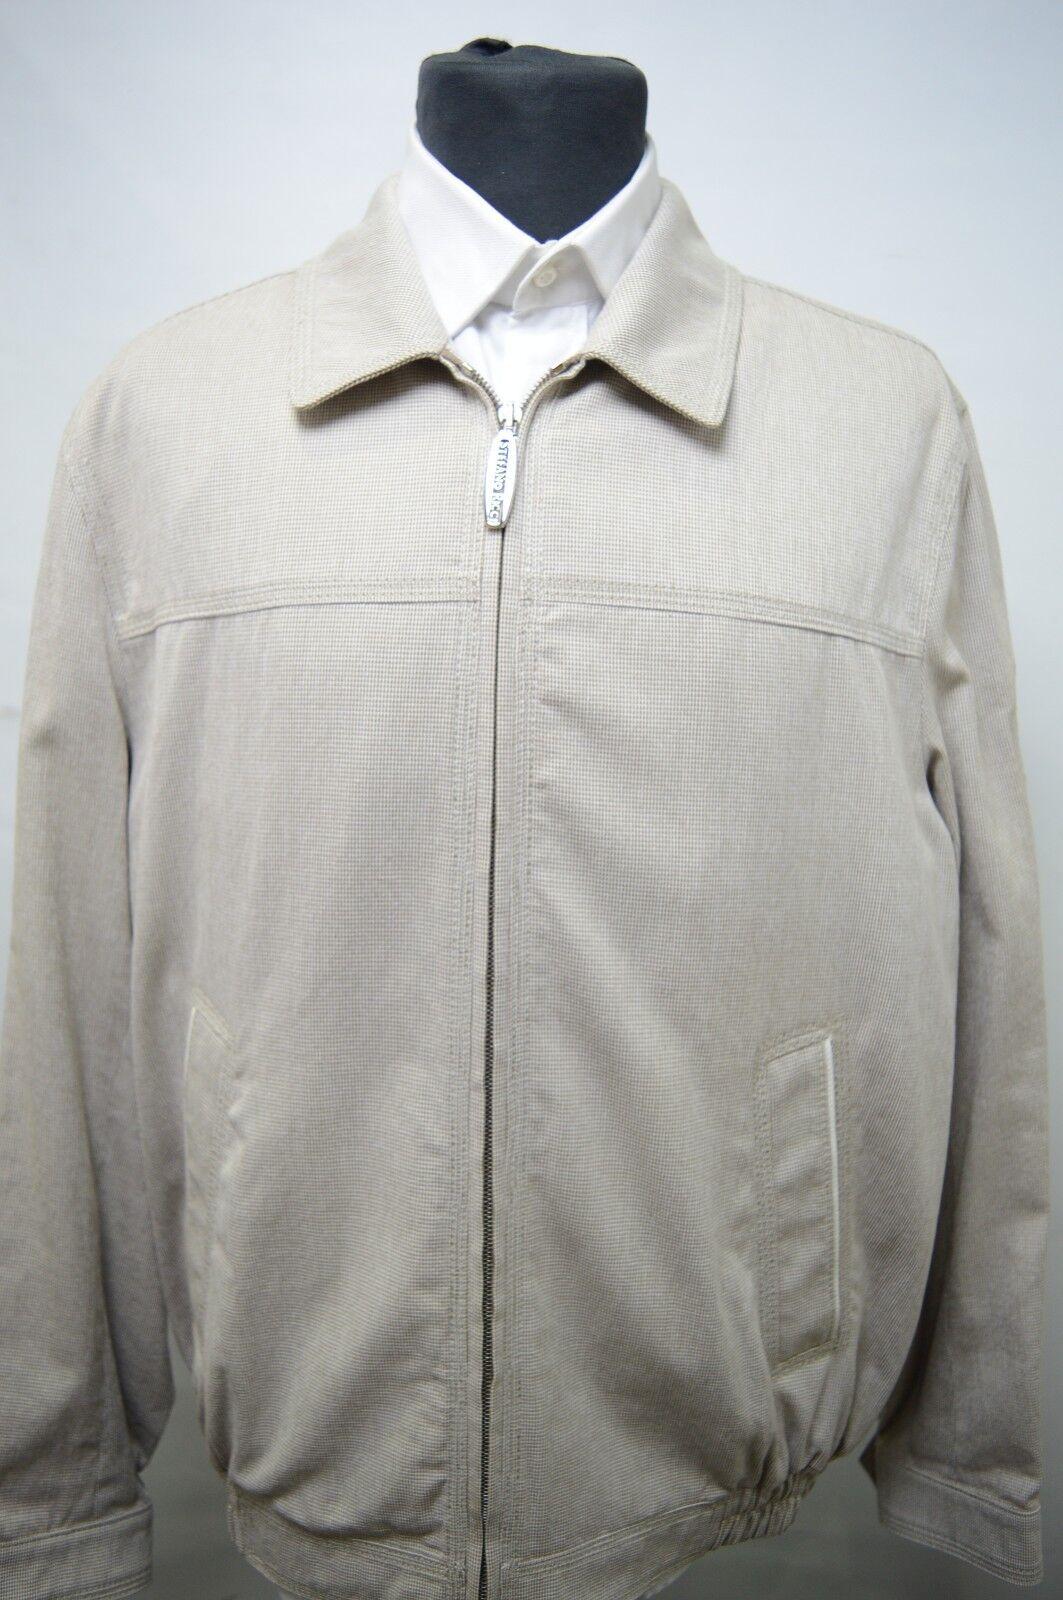 NEW 6450,00  STEFANO RICCI  Outwear Top Over Coat  Us M Eu 50 (G137)